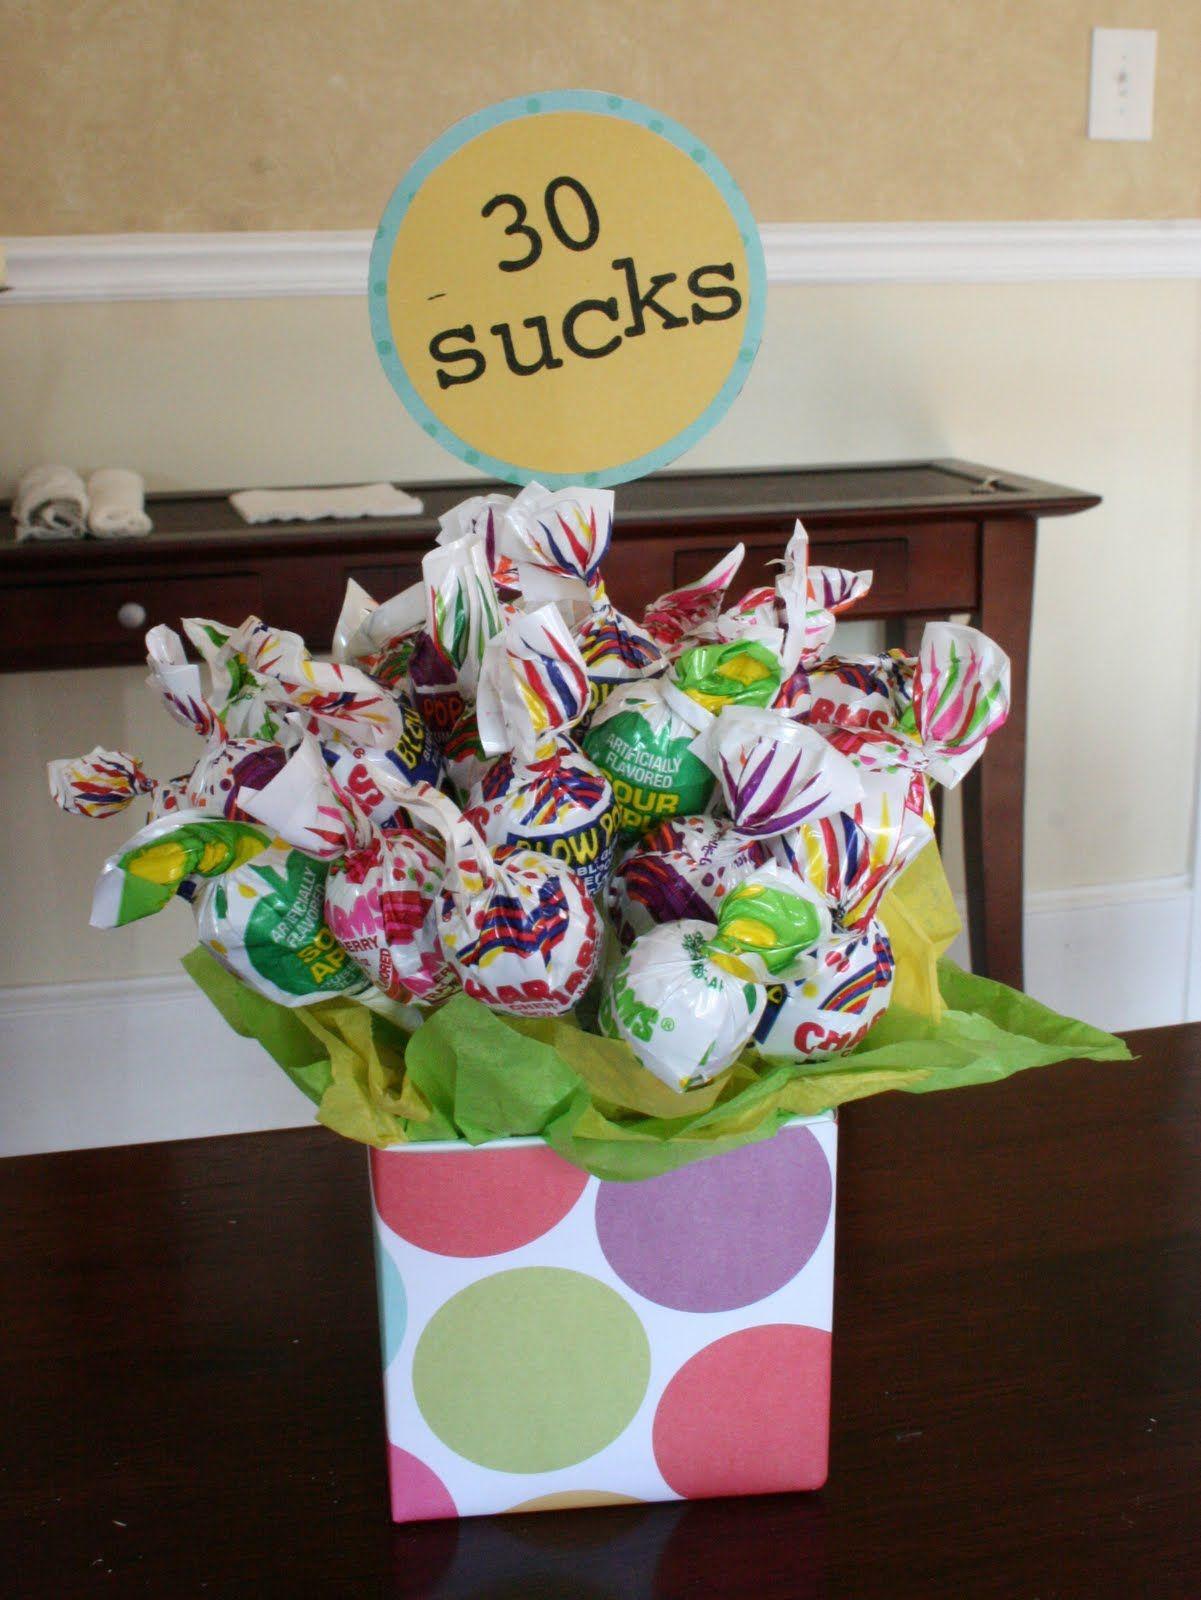 30 sucks birthday gift idea decoracion mesas dulces - Decoracion 30 cumpleanos ...